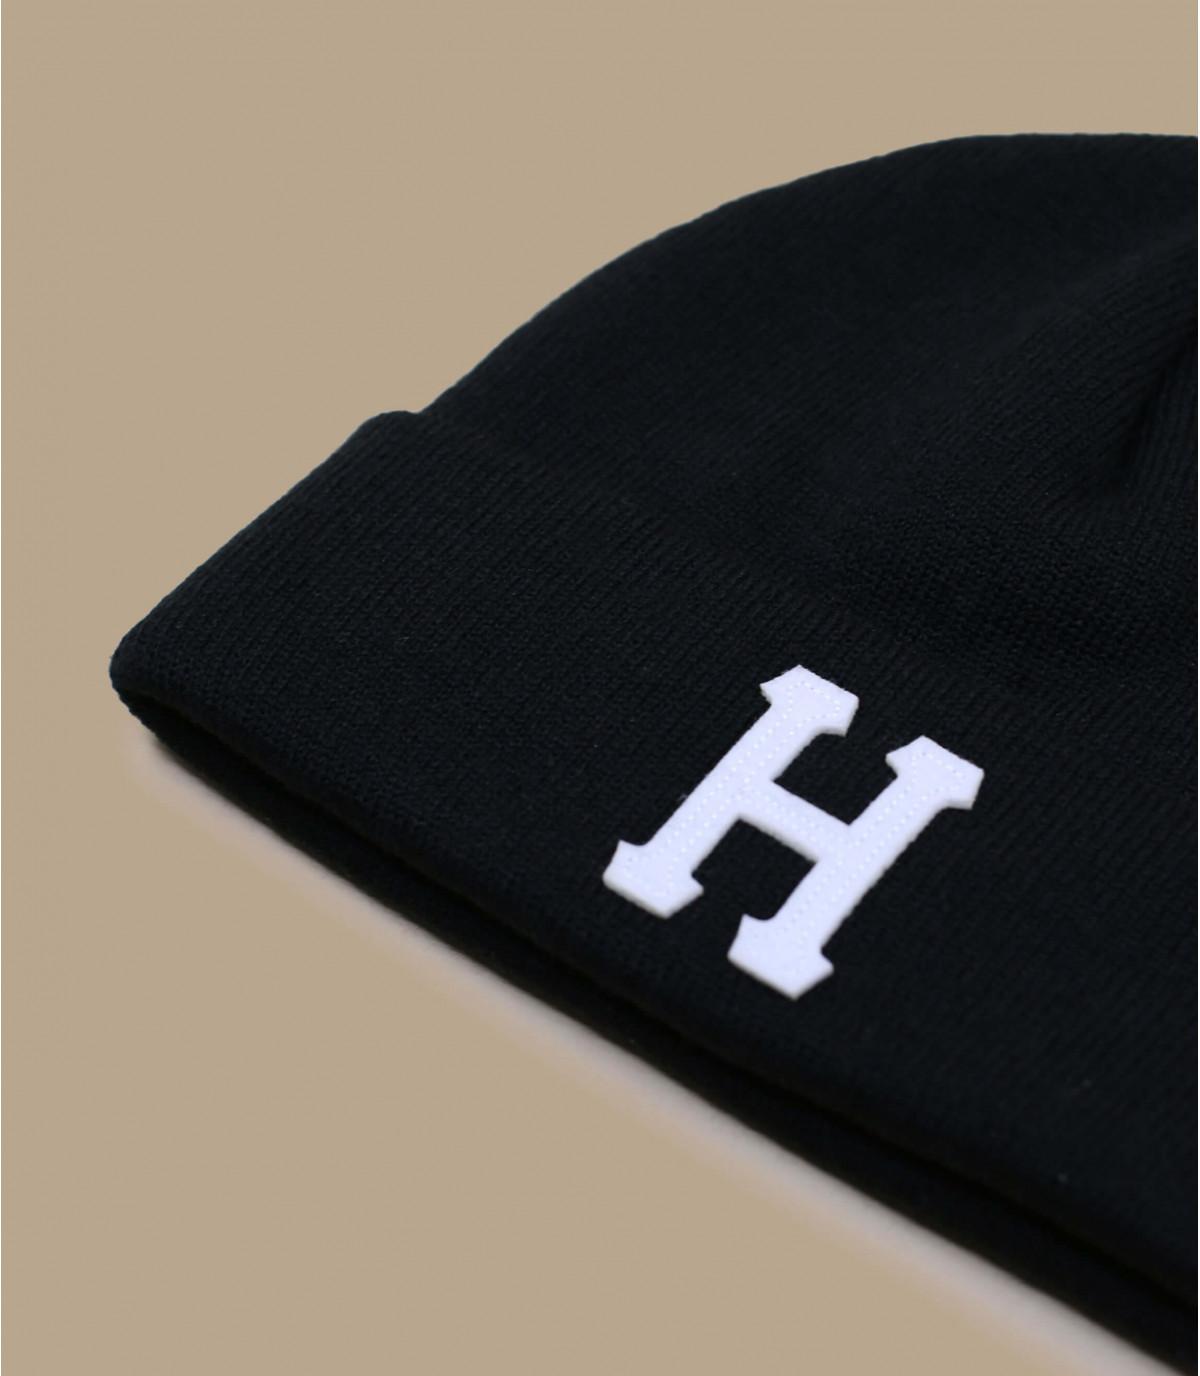 solapa gorro negro H - Classic H Beanie black de Huf. Headict 10635b210e1